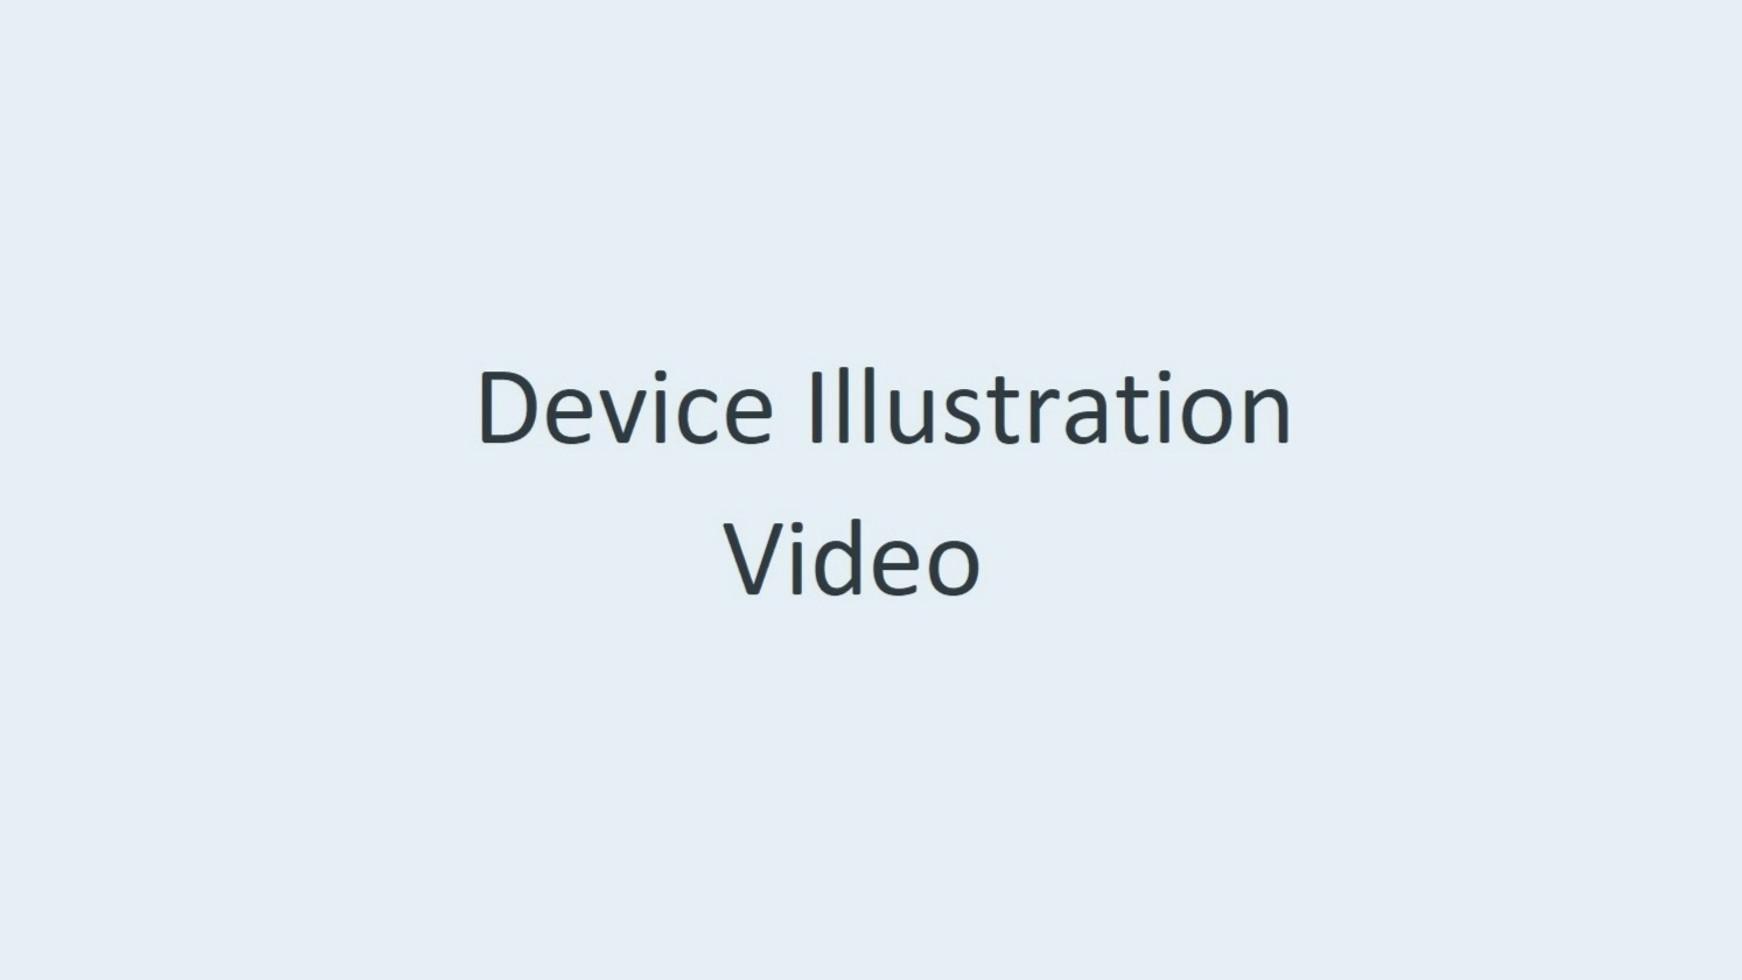 Device Illustration Video